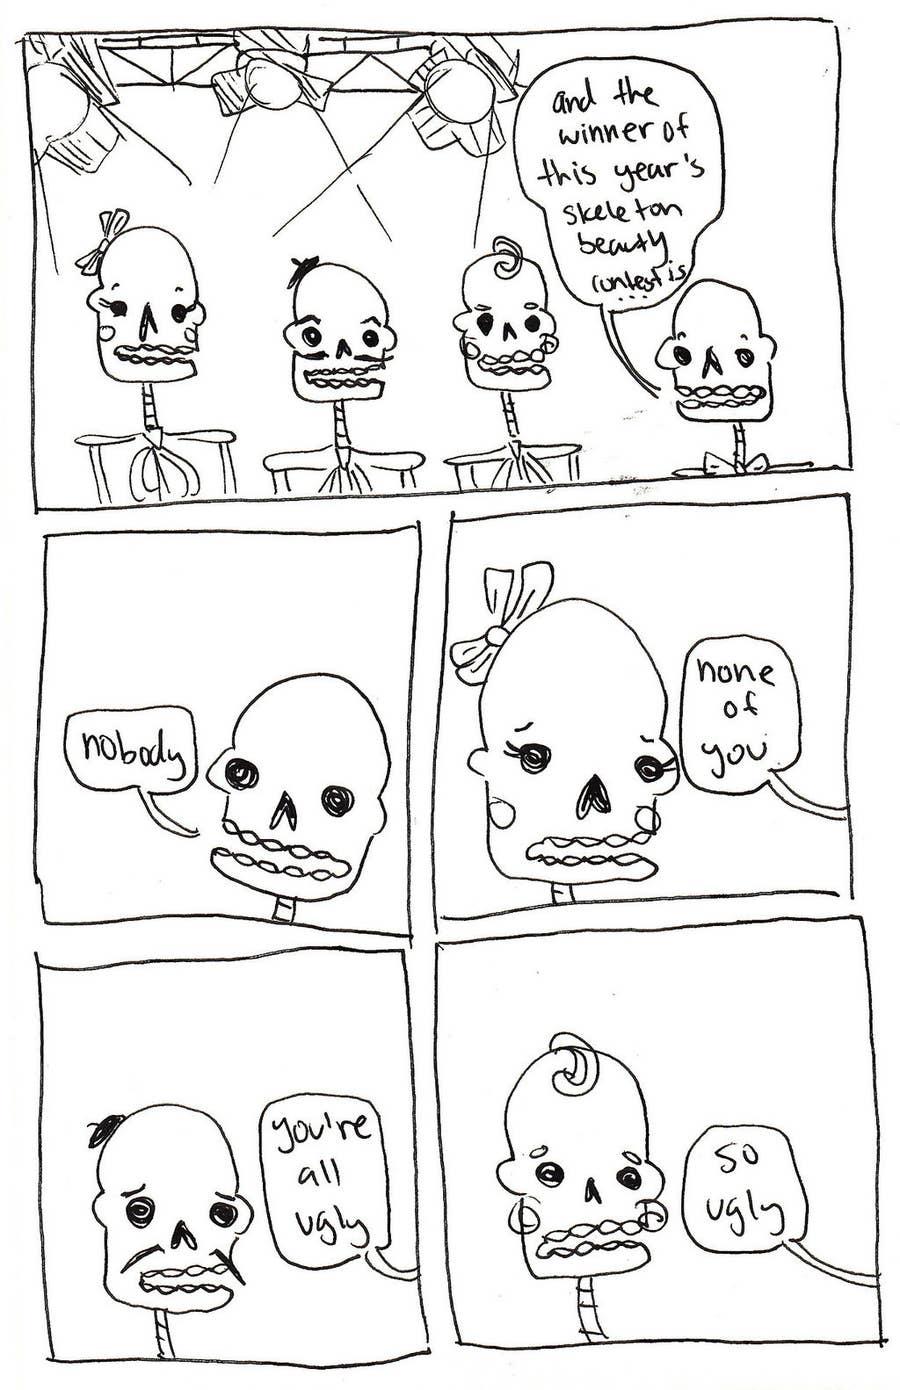 The skeleton beauty contest won who Mrs. Jones